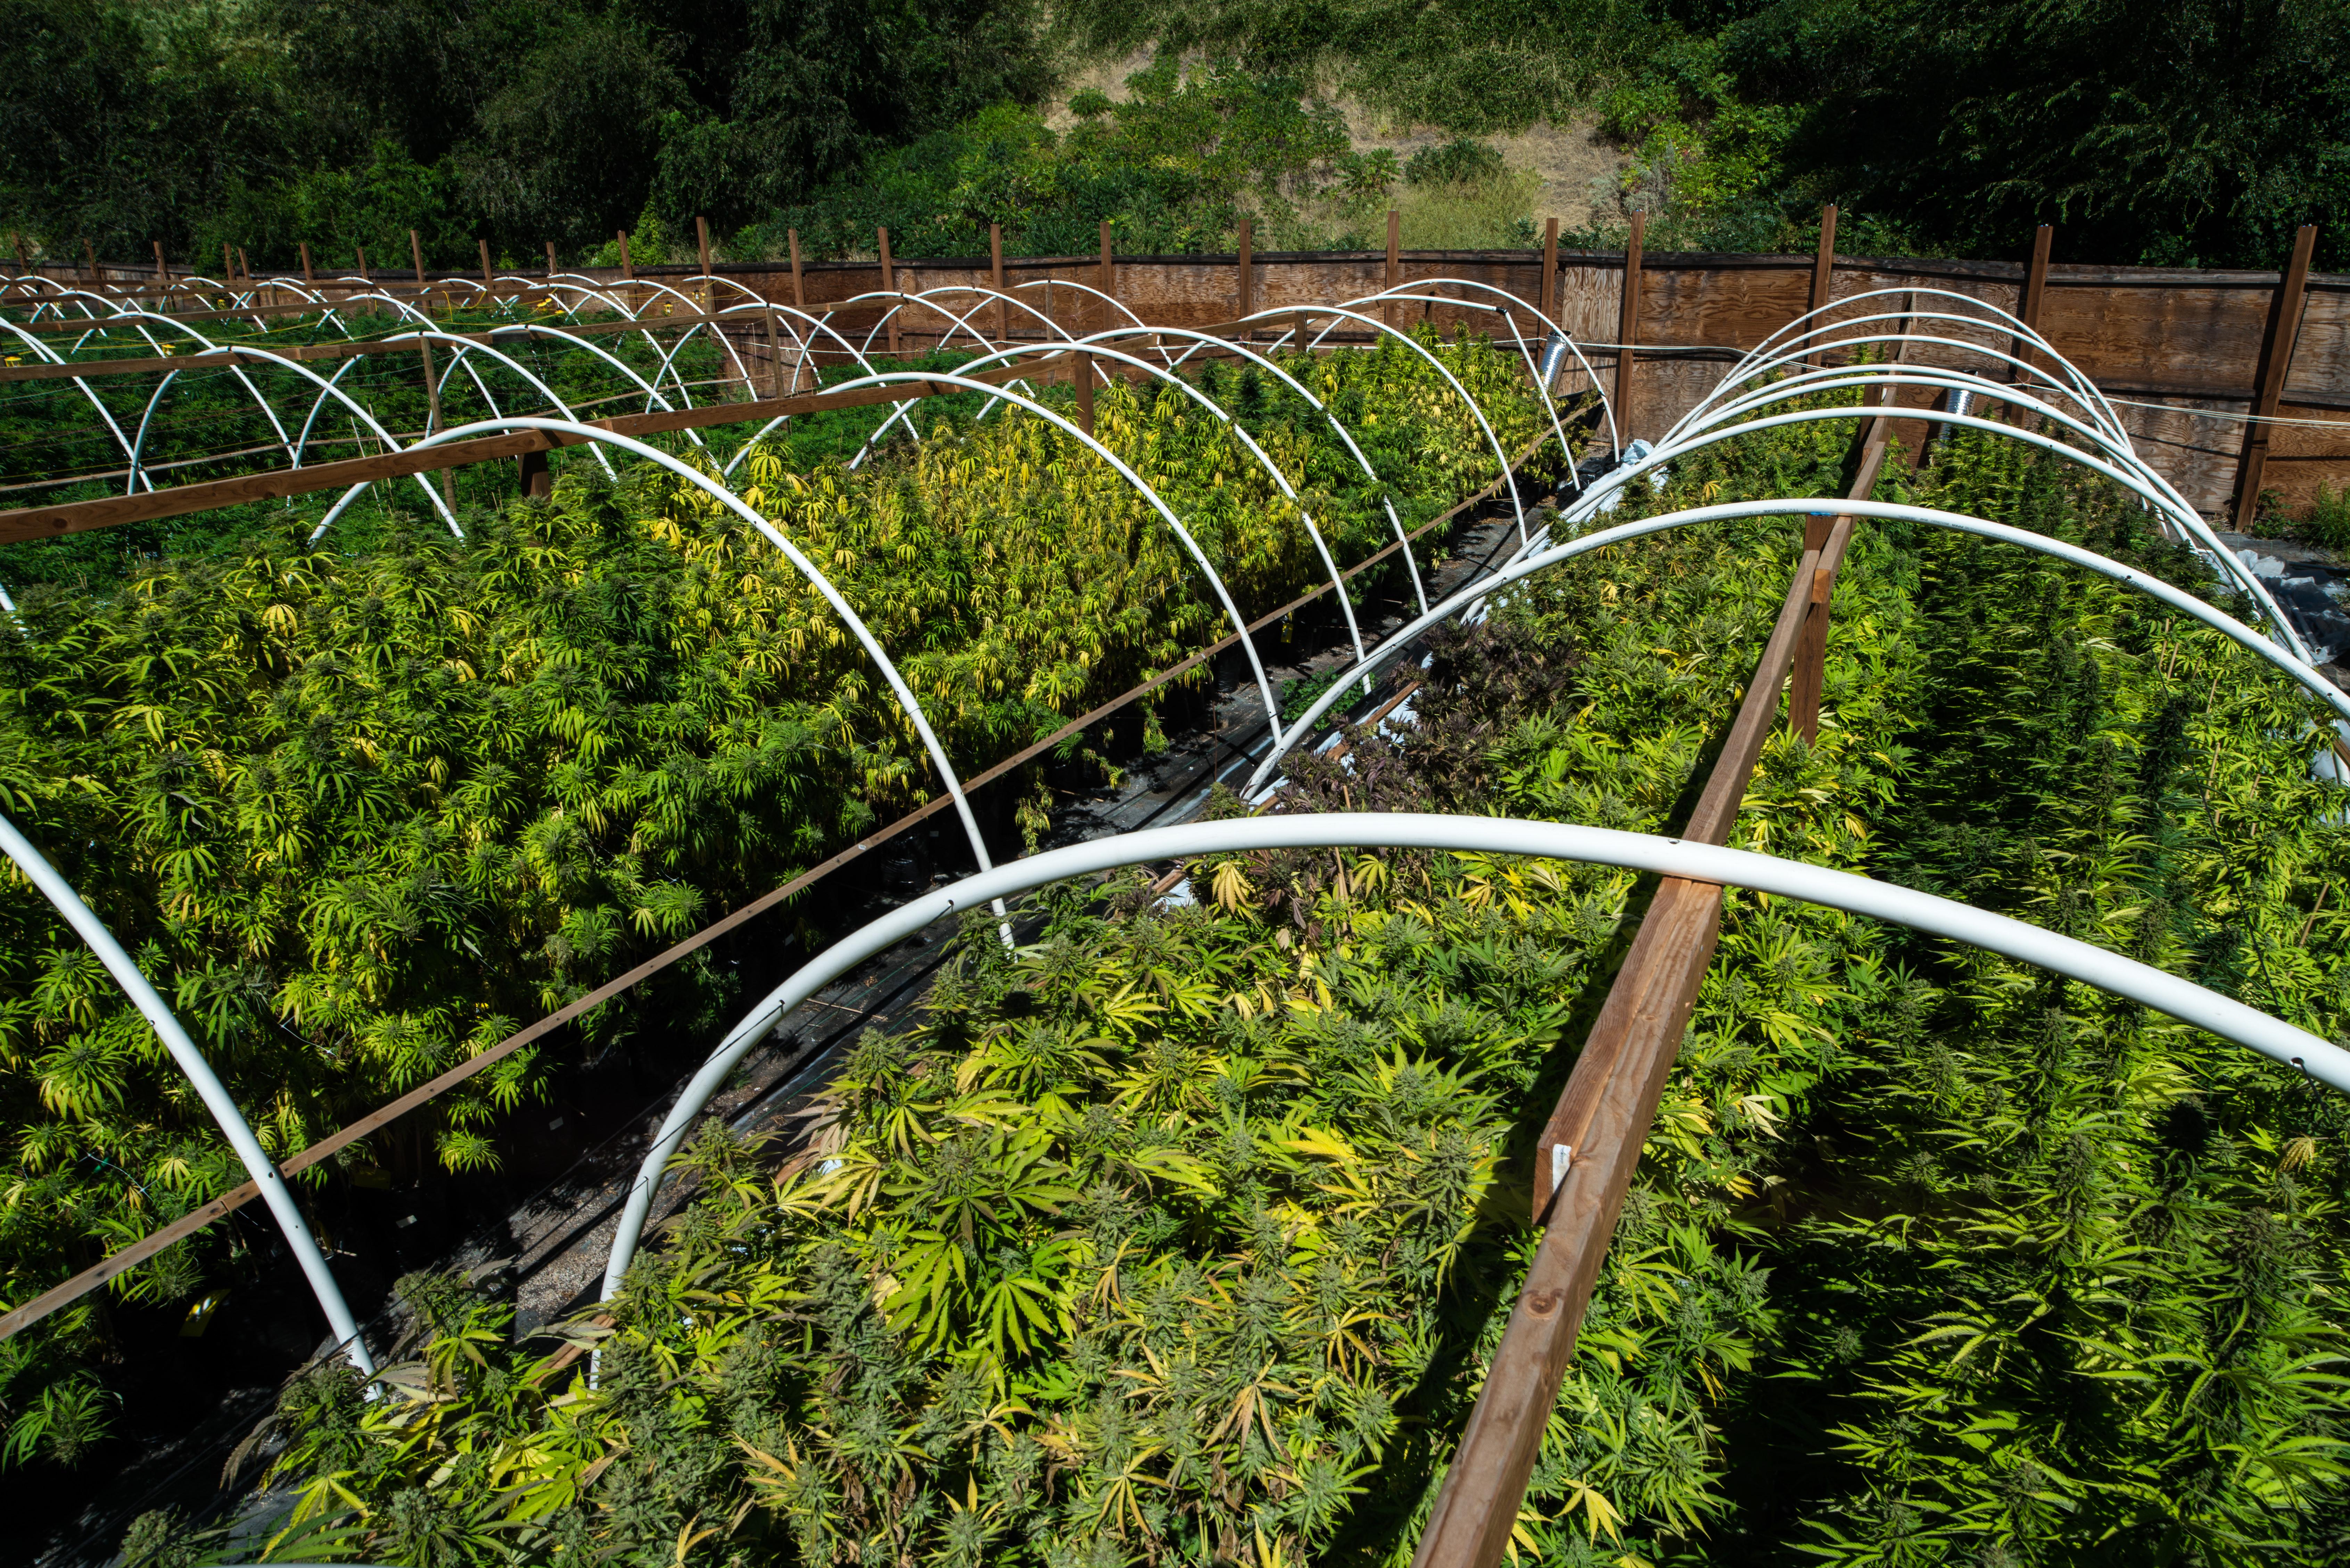 An outdoor commercial cannabis farm.